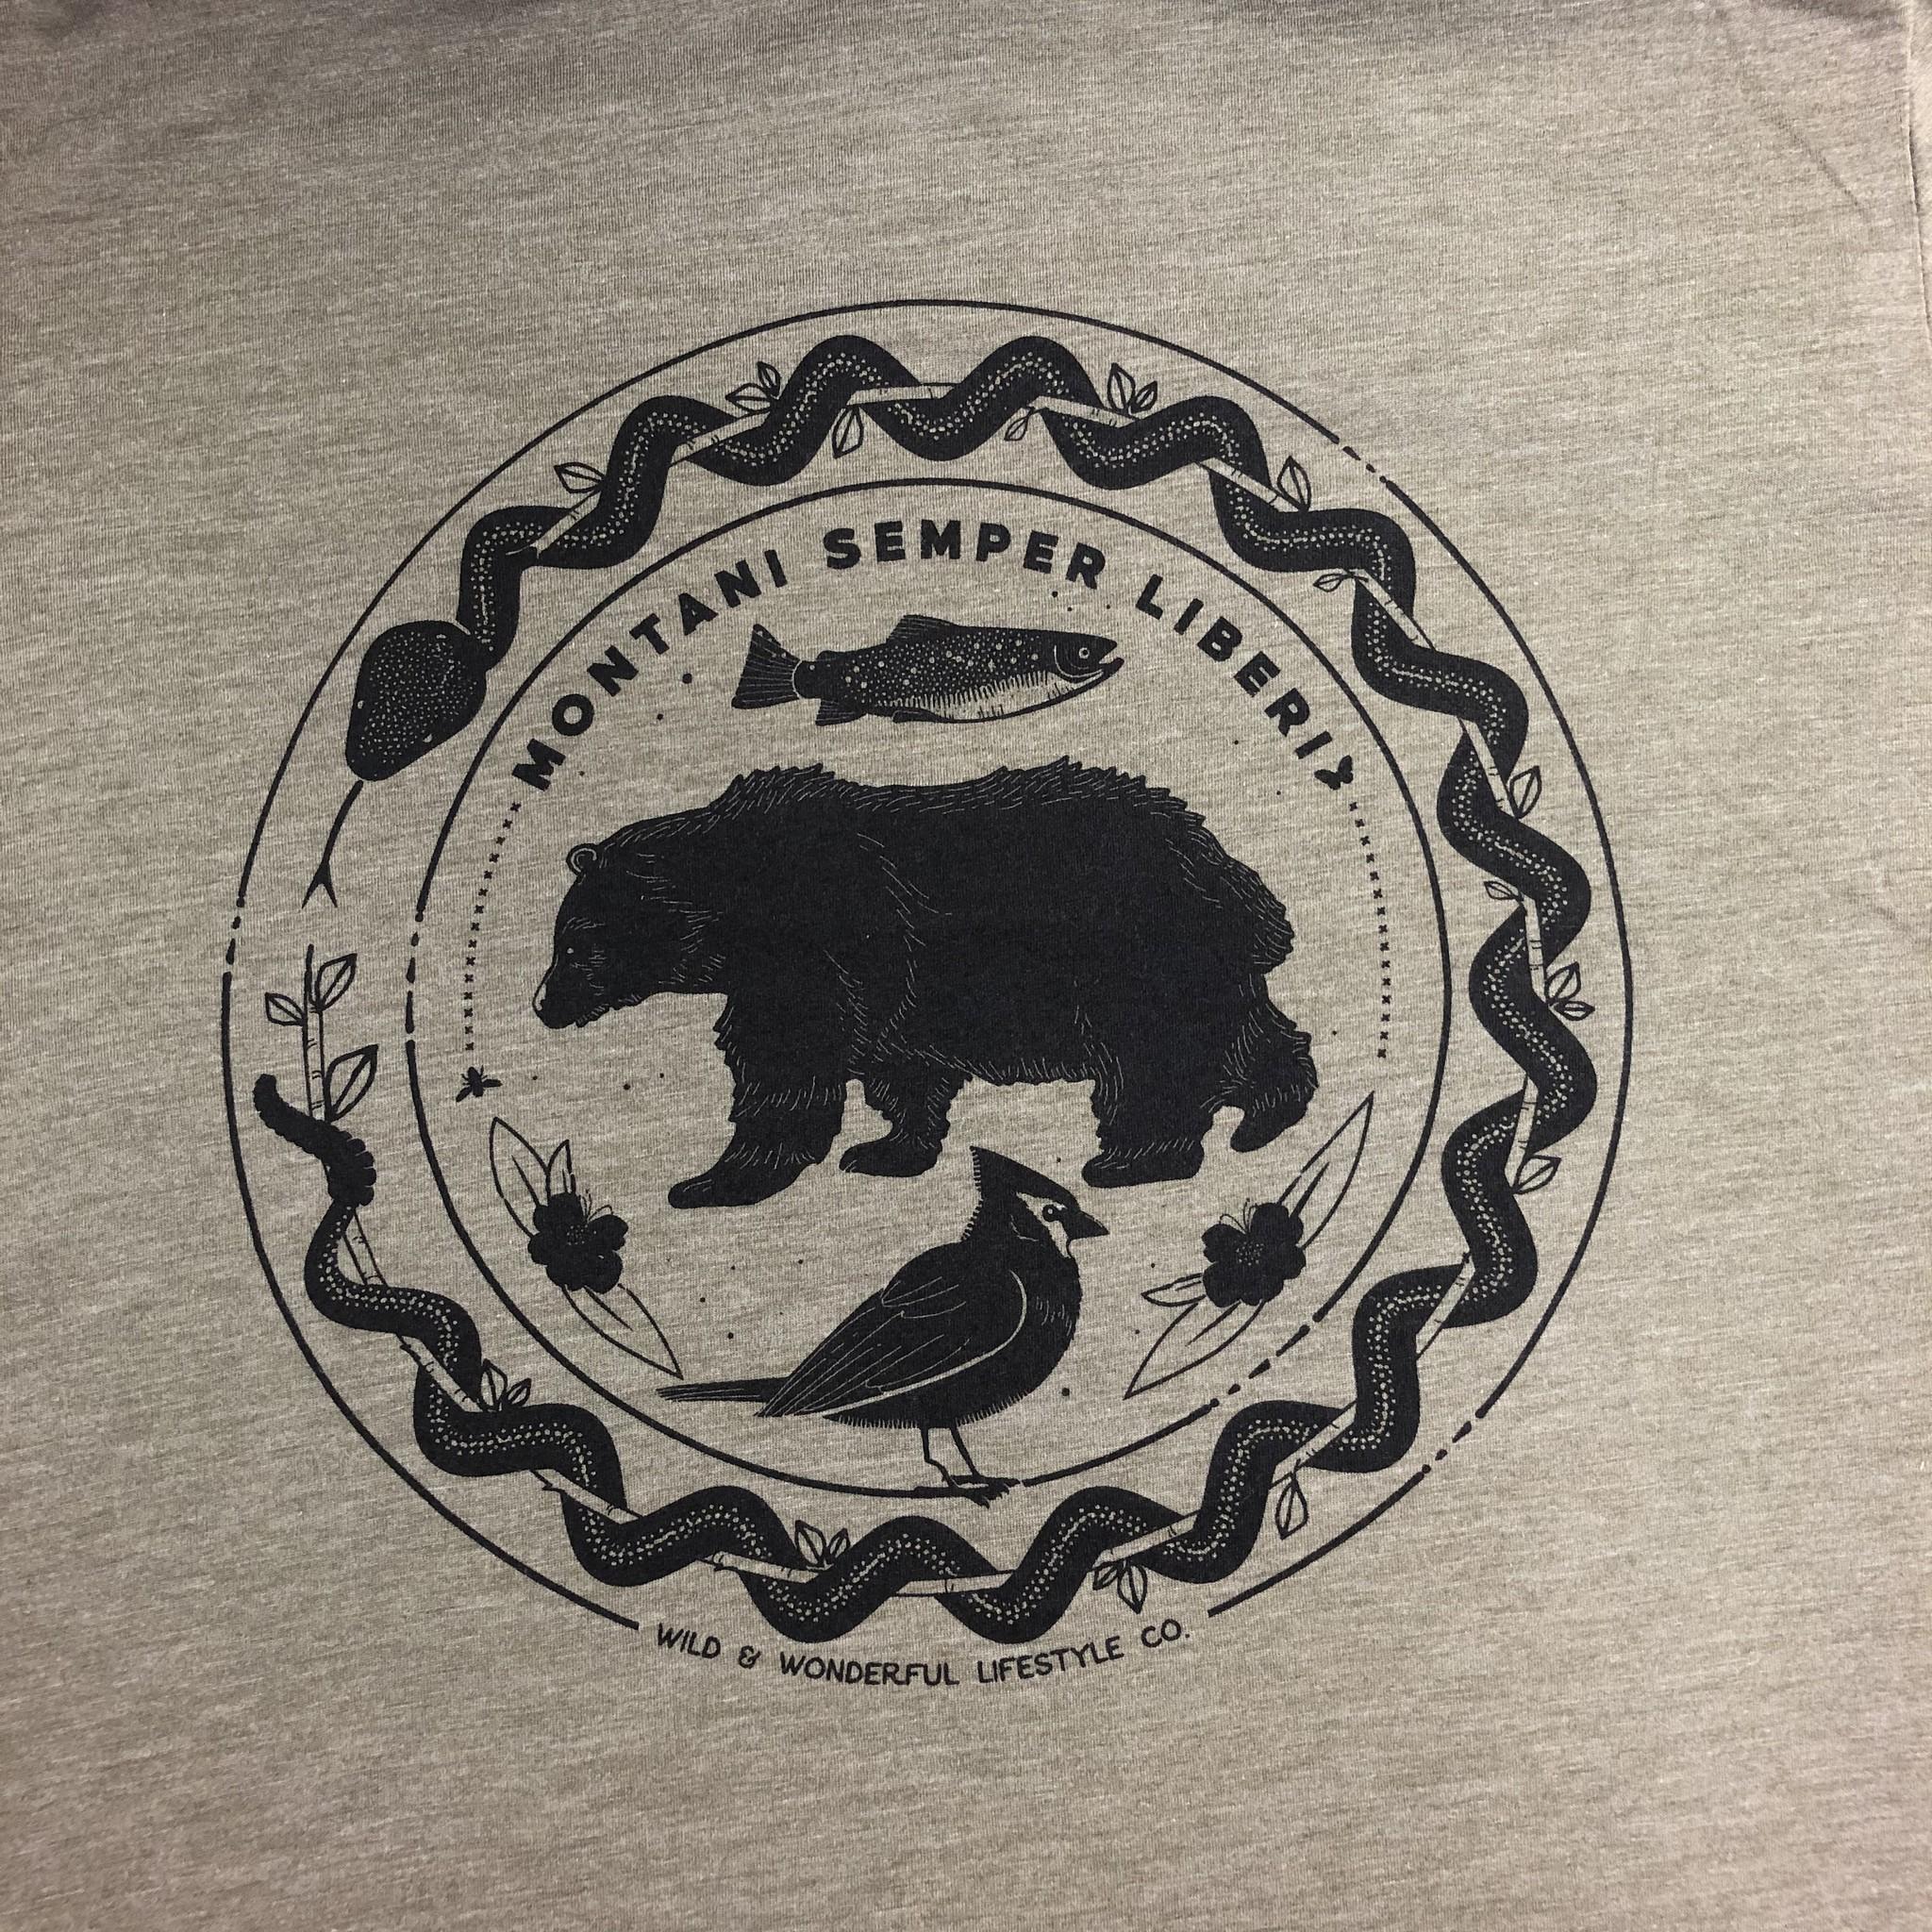 Wild & Wonderful Lifestyle Company WV Mountain Semper Bear Tee Sm